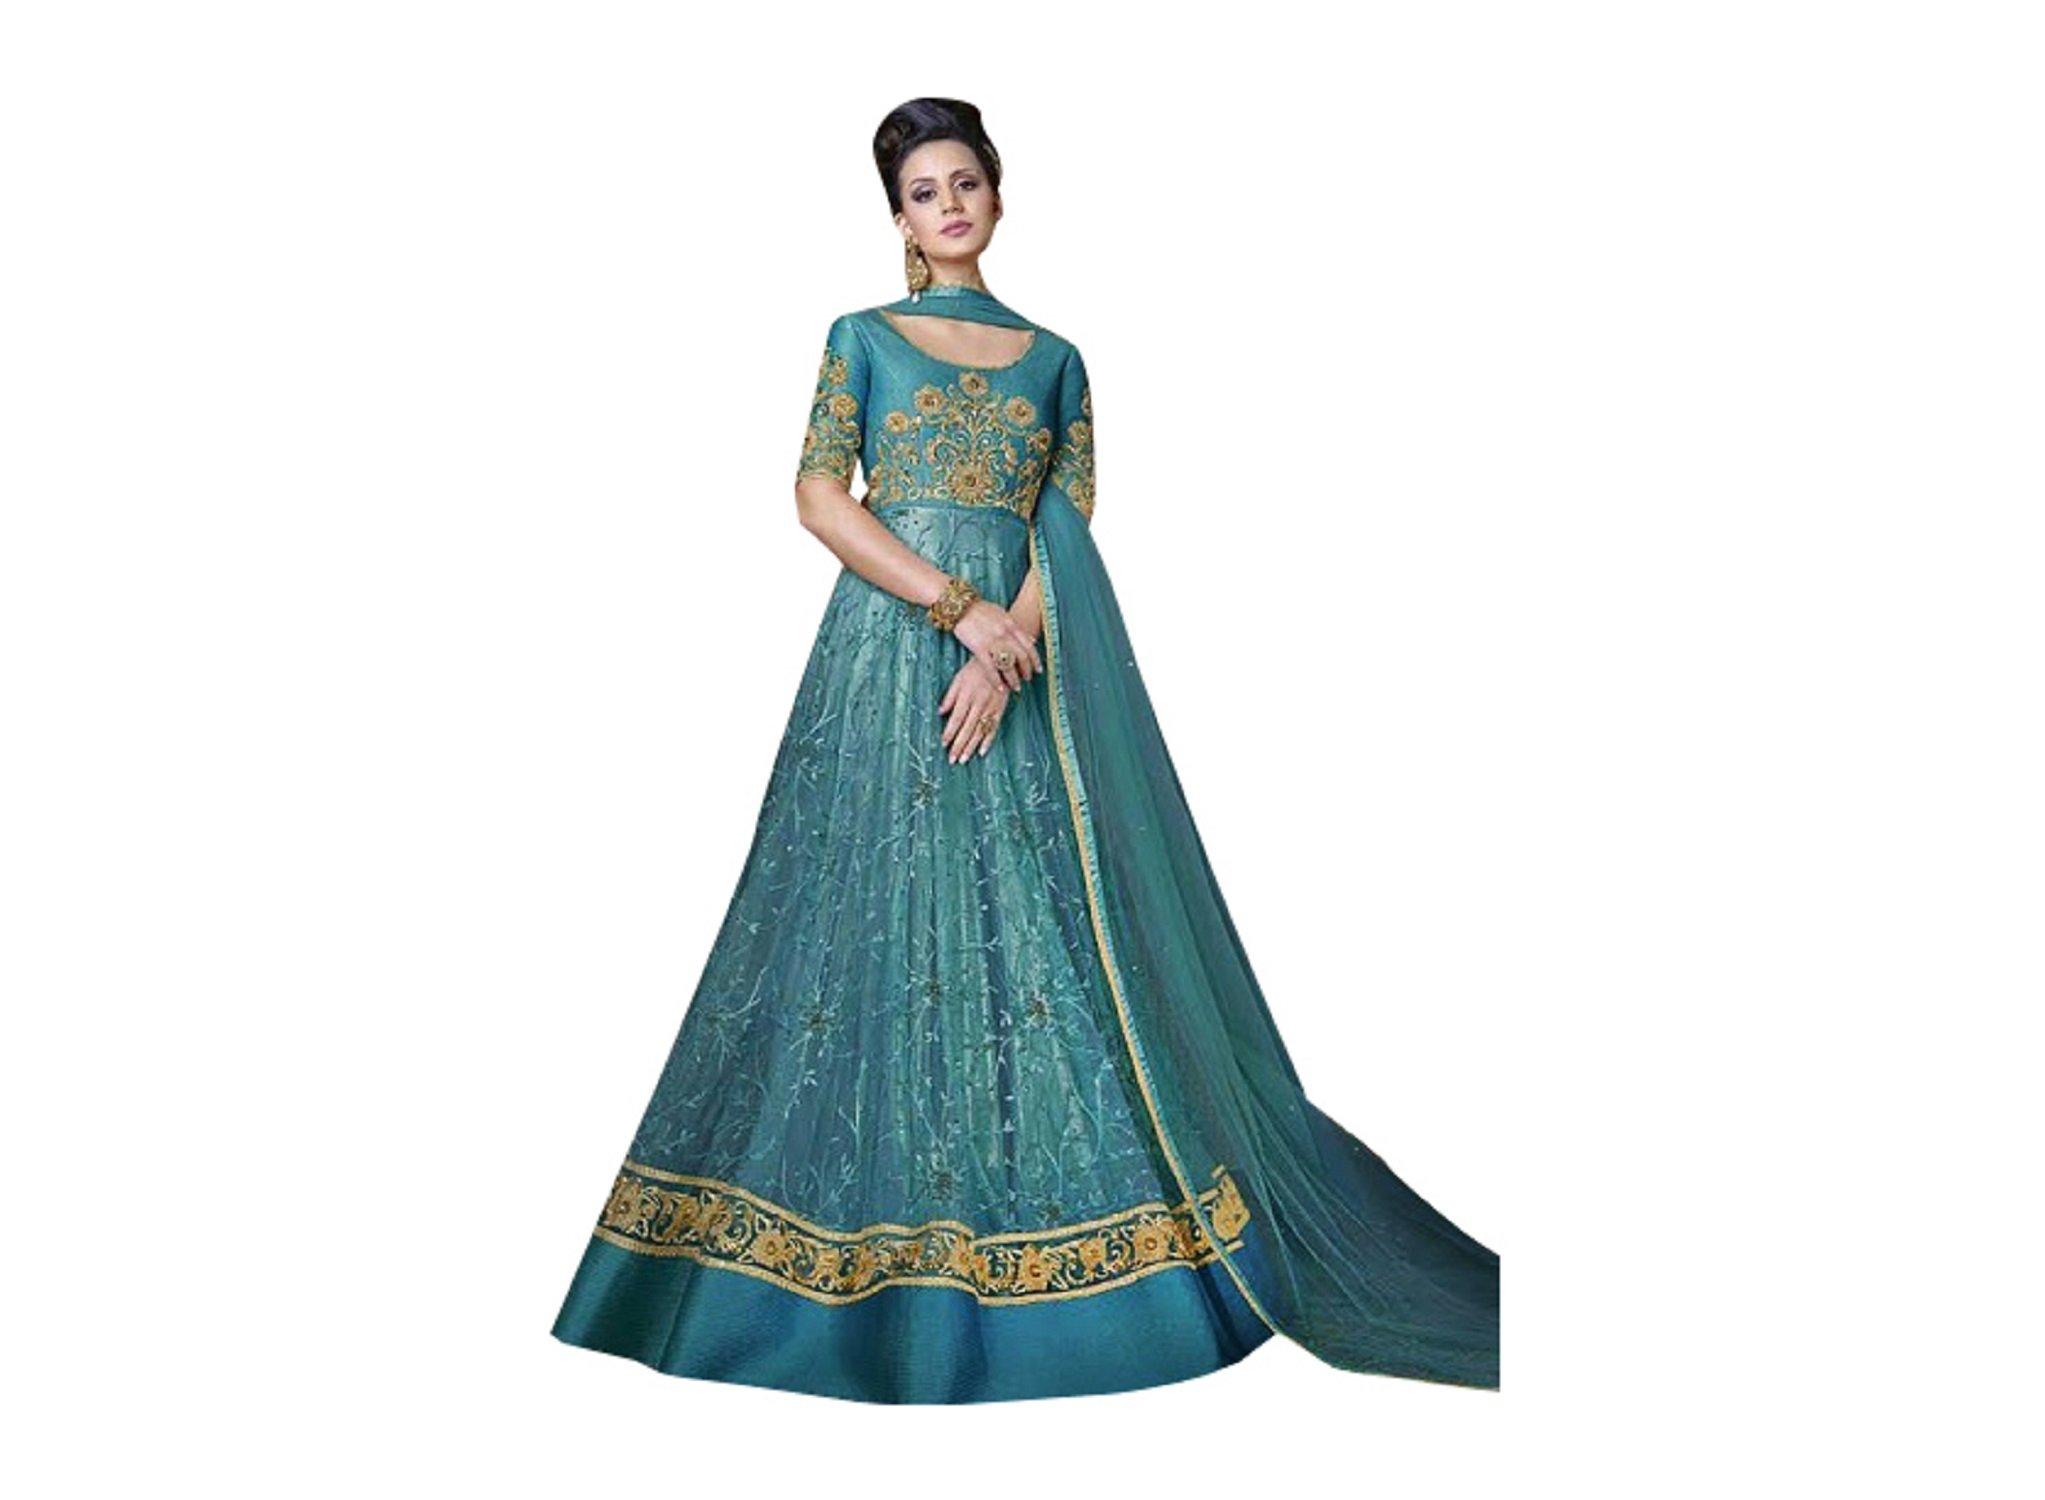 Designer Party Wear Gown Long Dress Bollywood Indian Ethnic Wedding Women Muslim Bridal Embroidery Zari Work 640 (Light Blue)